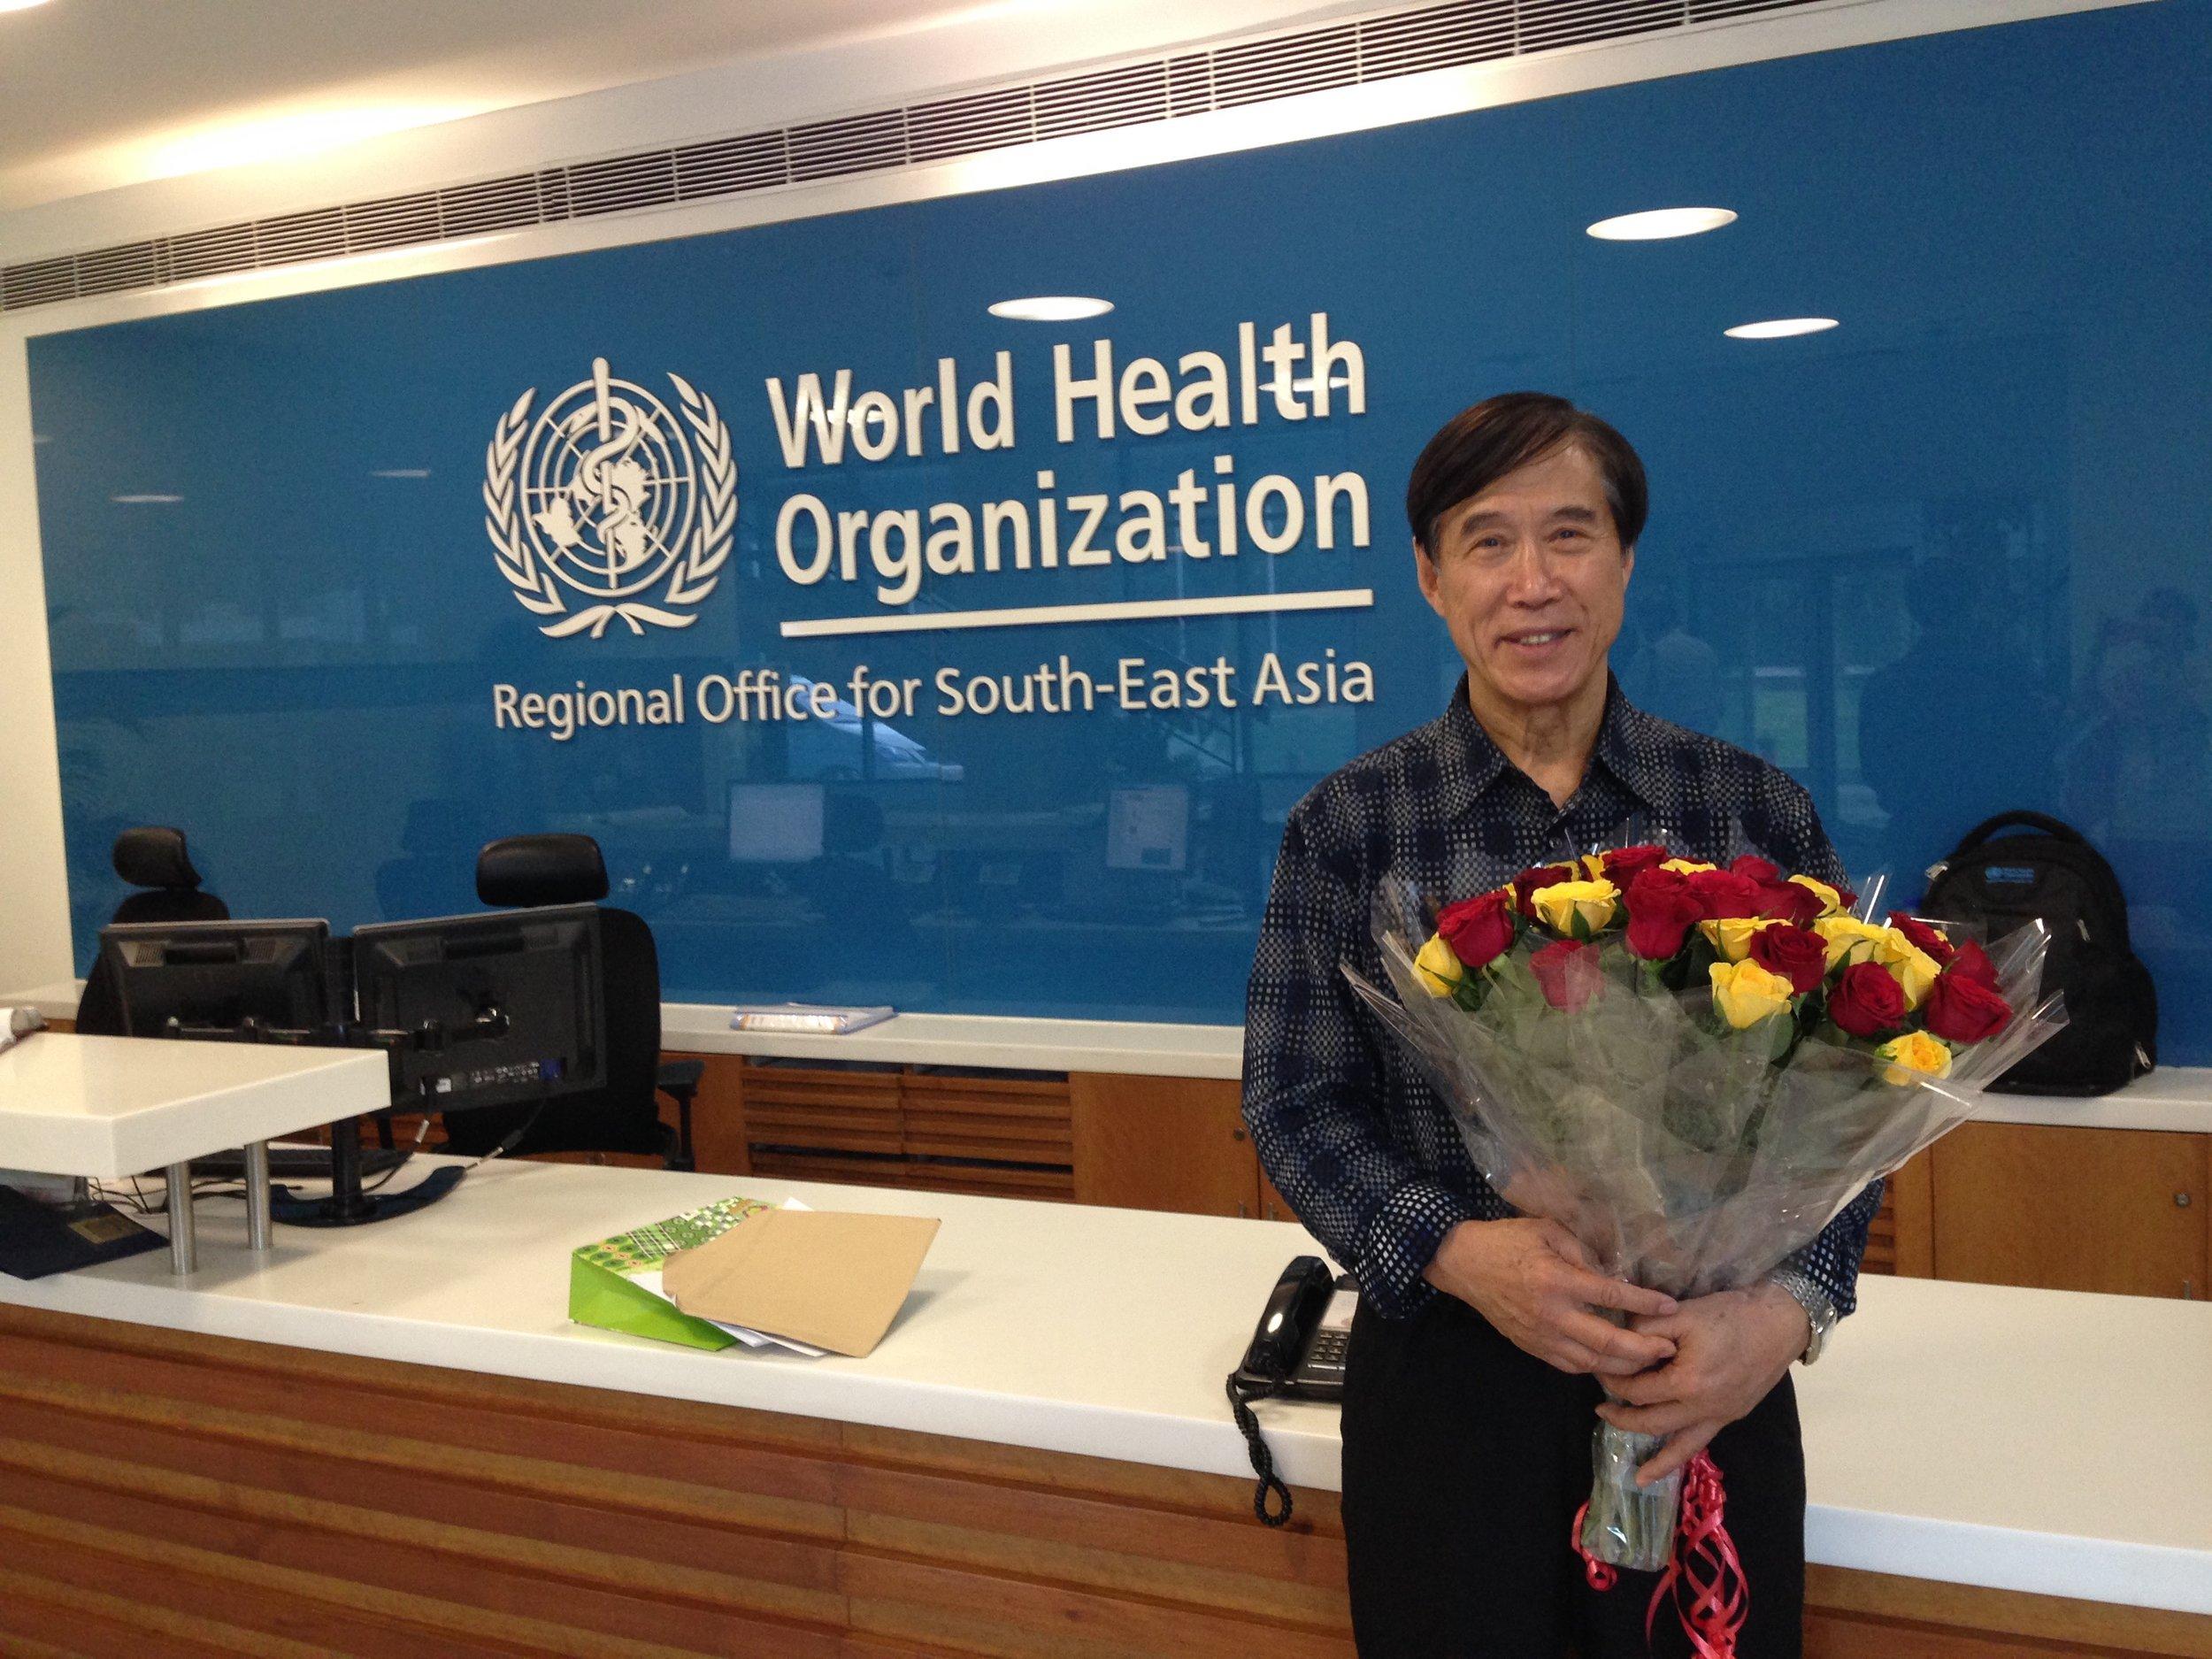 World Health Organization, New Delhi, 2015